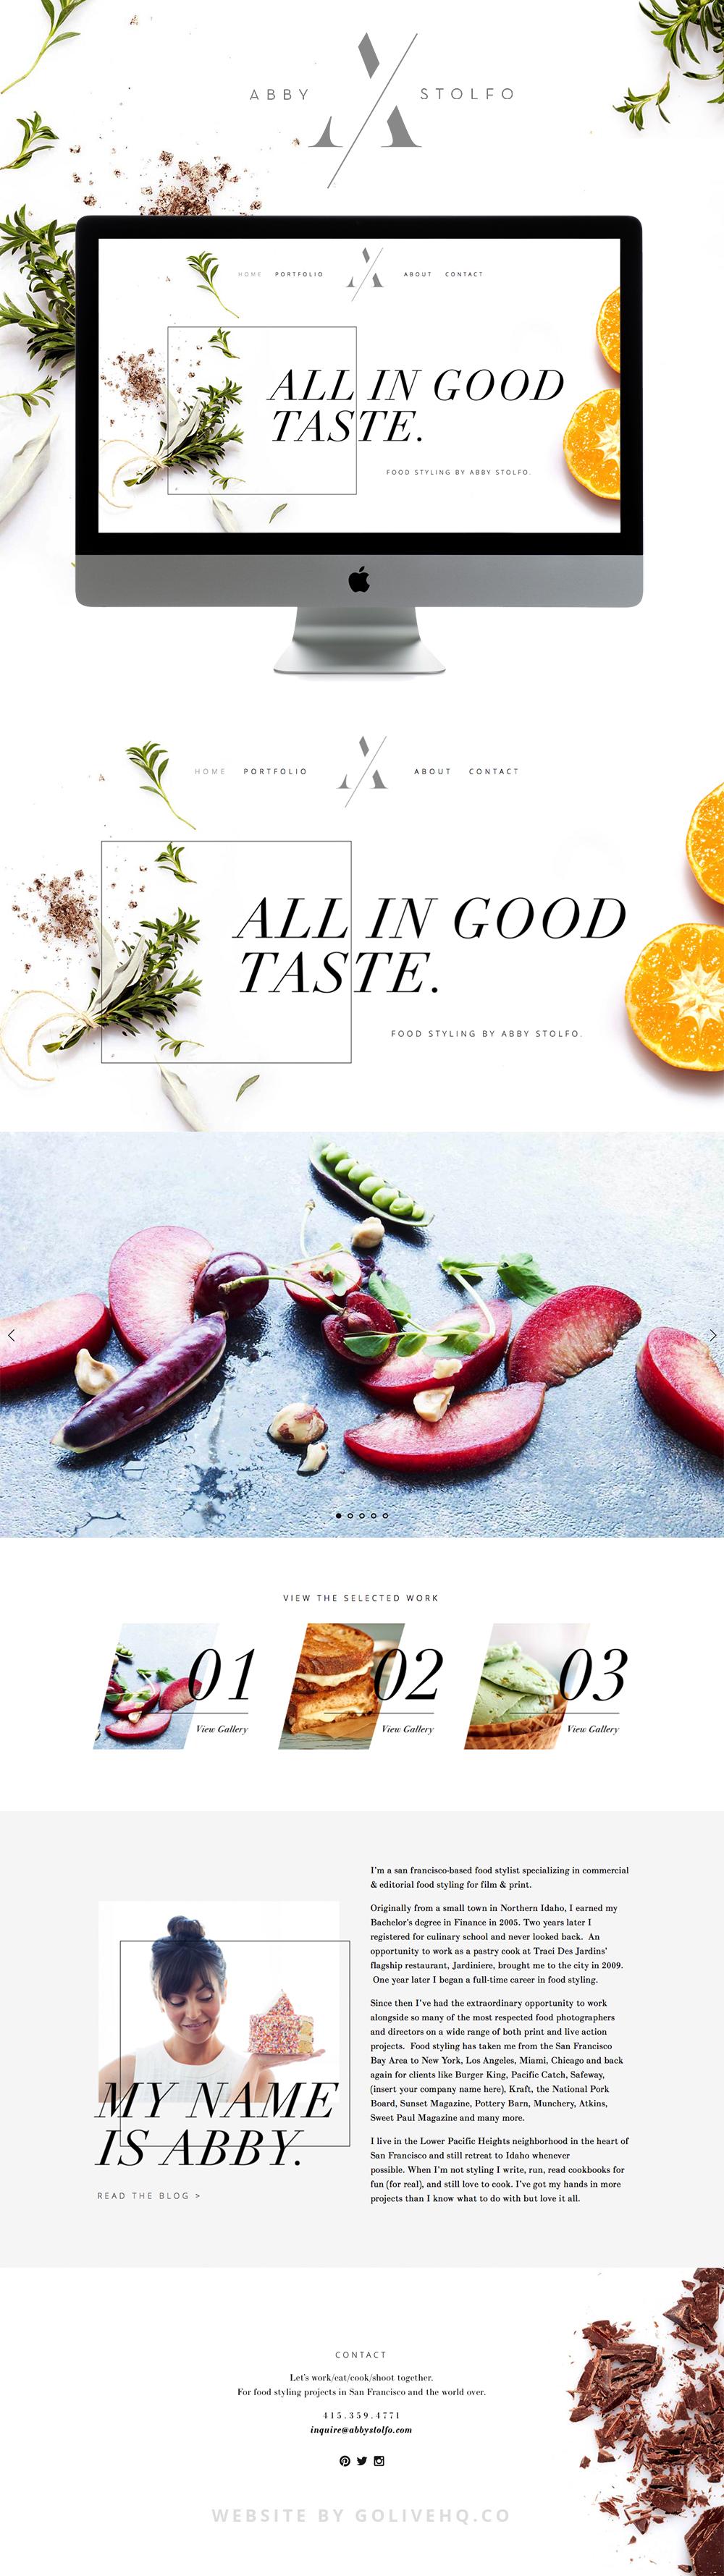 modern food squarespace blog design  |  By GOLIVEHQ.CO